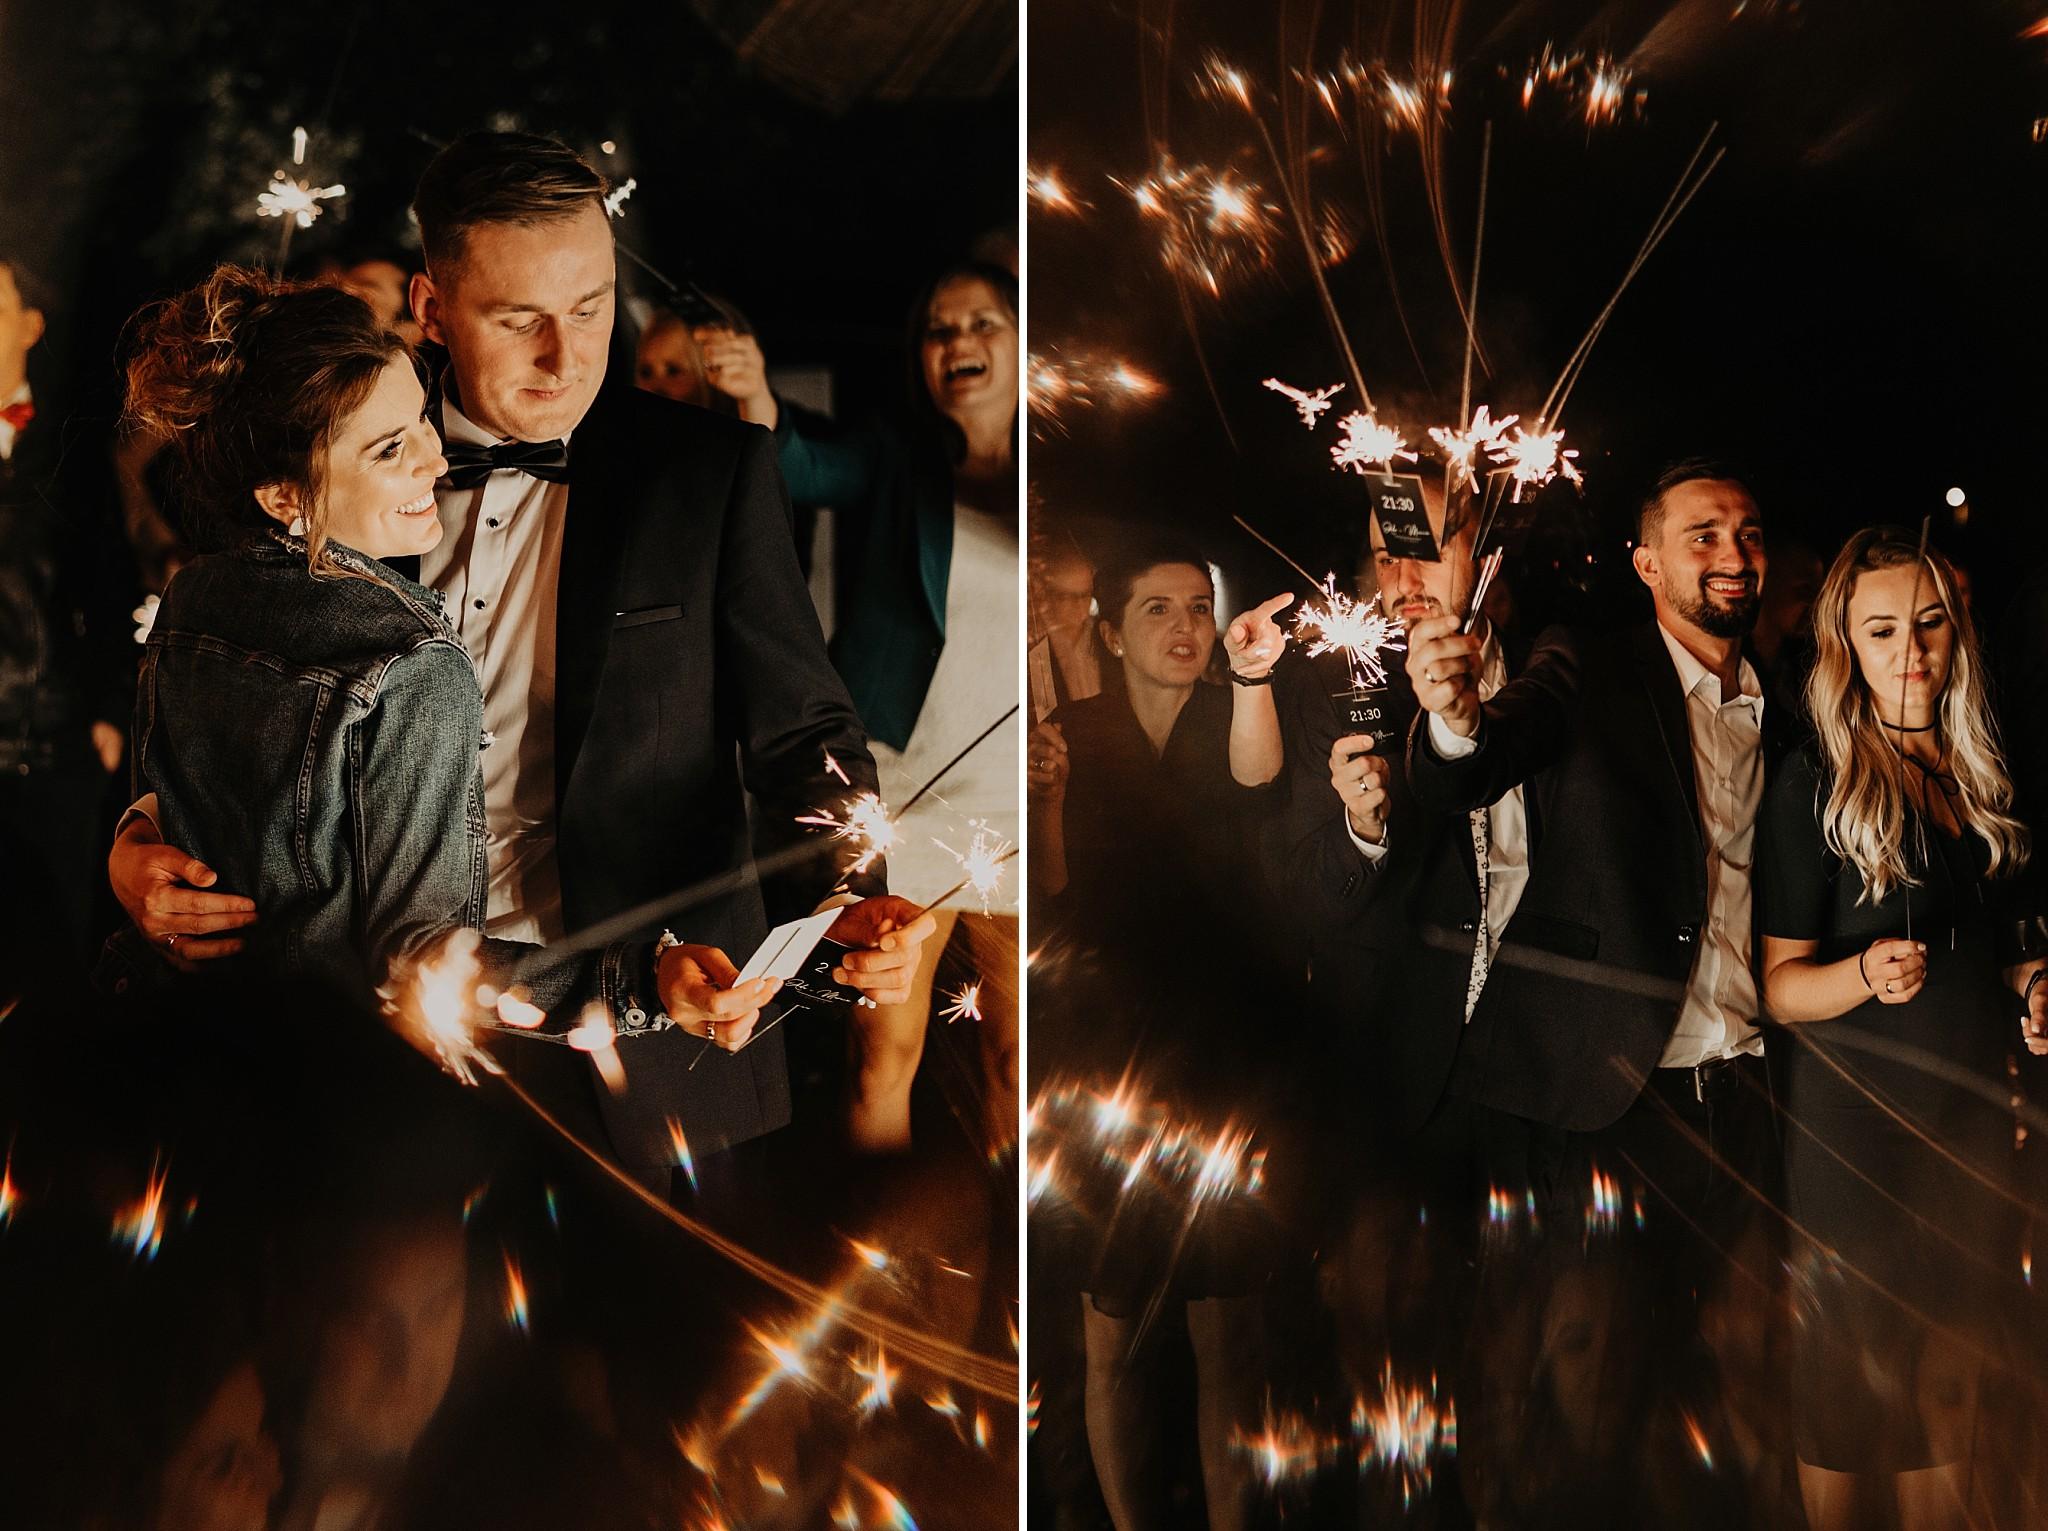 fotograf poznan wesele dobra truskawka piekne wesele pod poznaniem wesele w dobrej truskawce piekna para mloda slub marzen slub koronawirus slub listopad wesele koronawirus 504